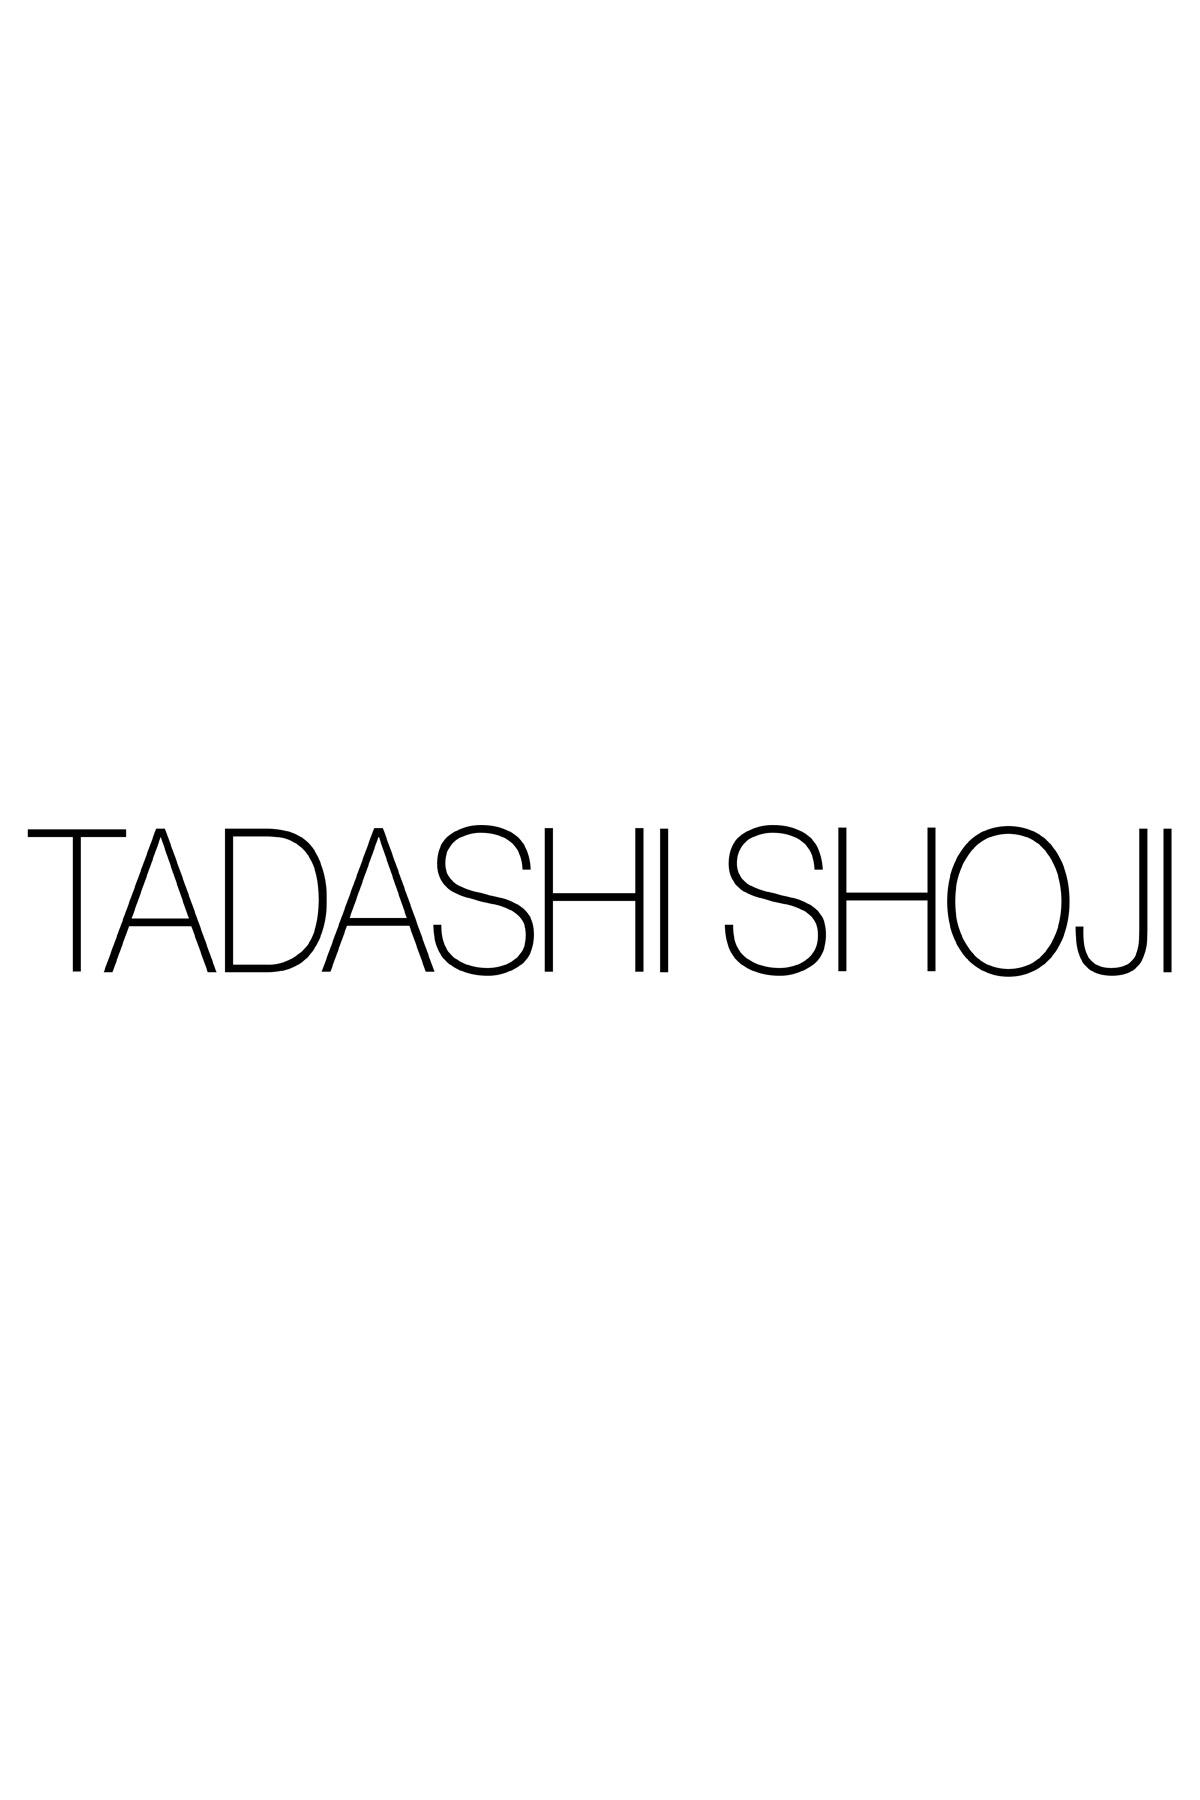 Tadashi Shoji - Peony Embroidered Dress - Detail